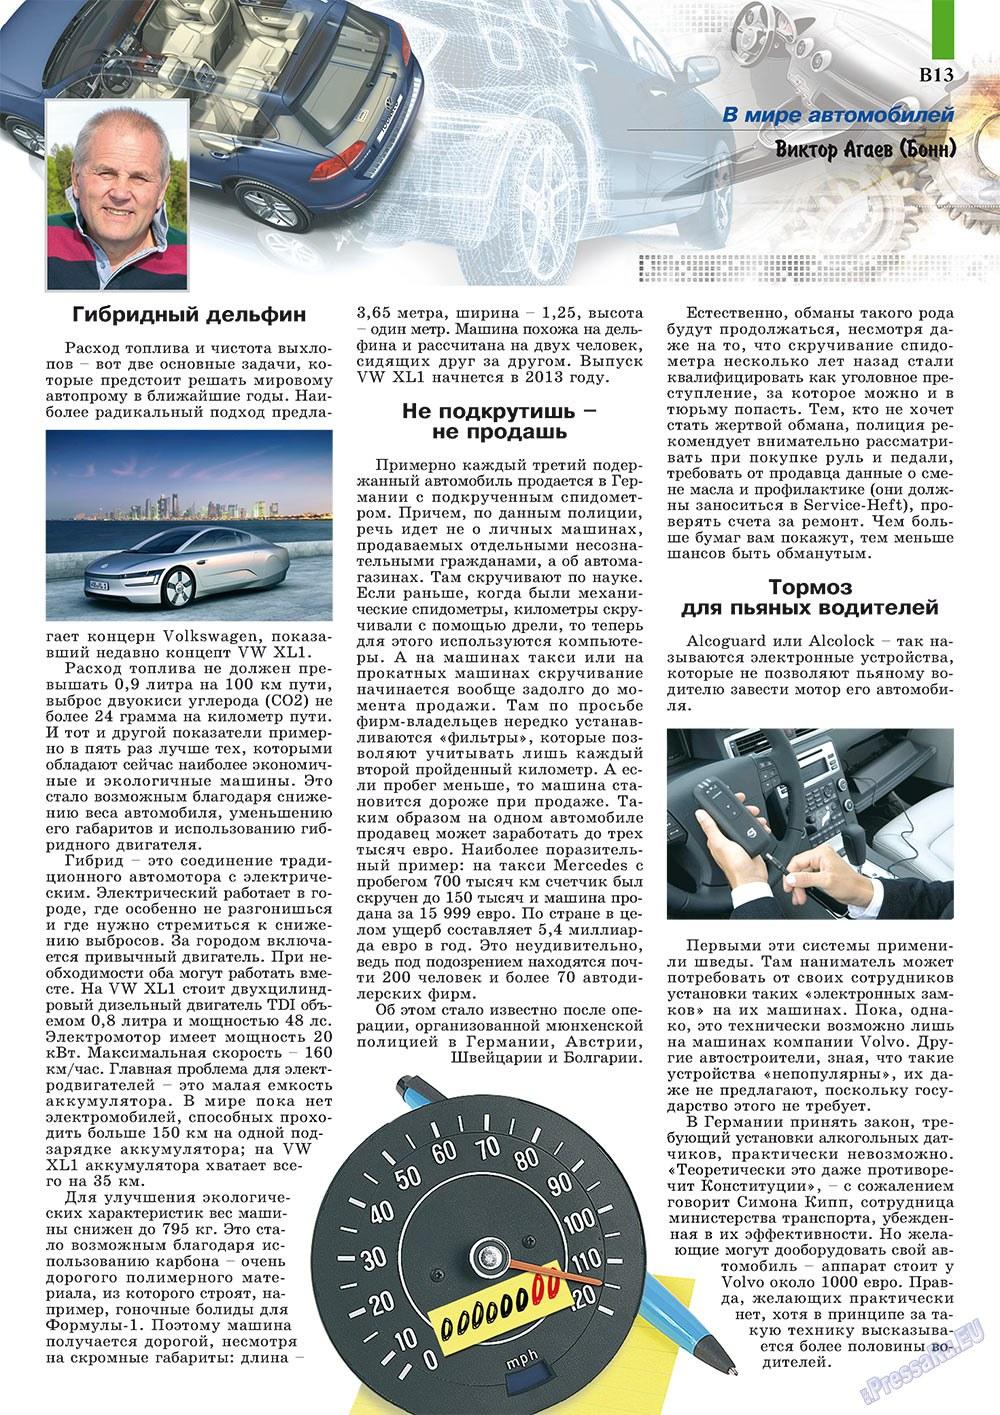 Партнер-север (журнал). 2011 год, номер 4, стр. 23